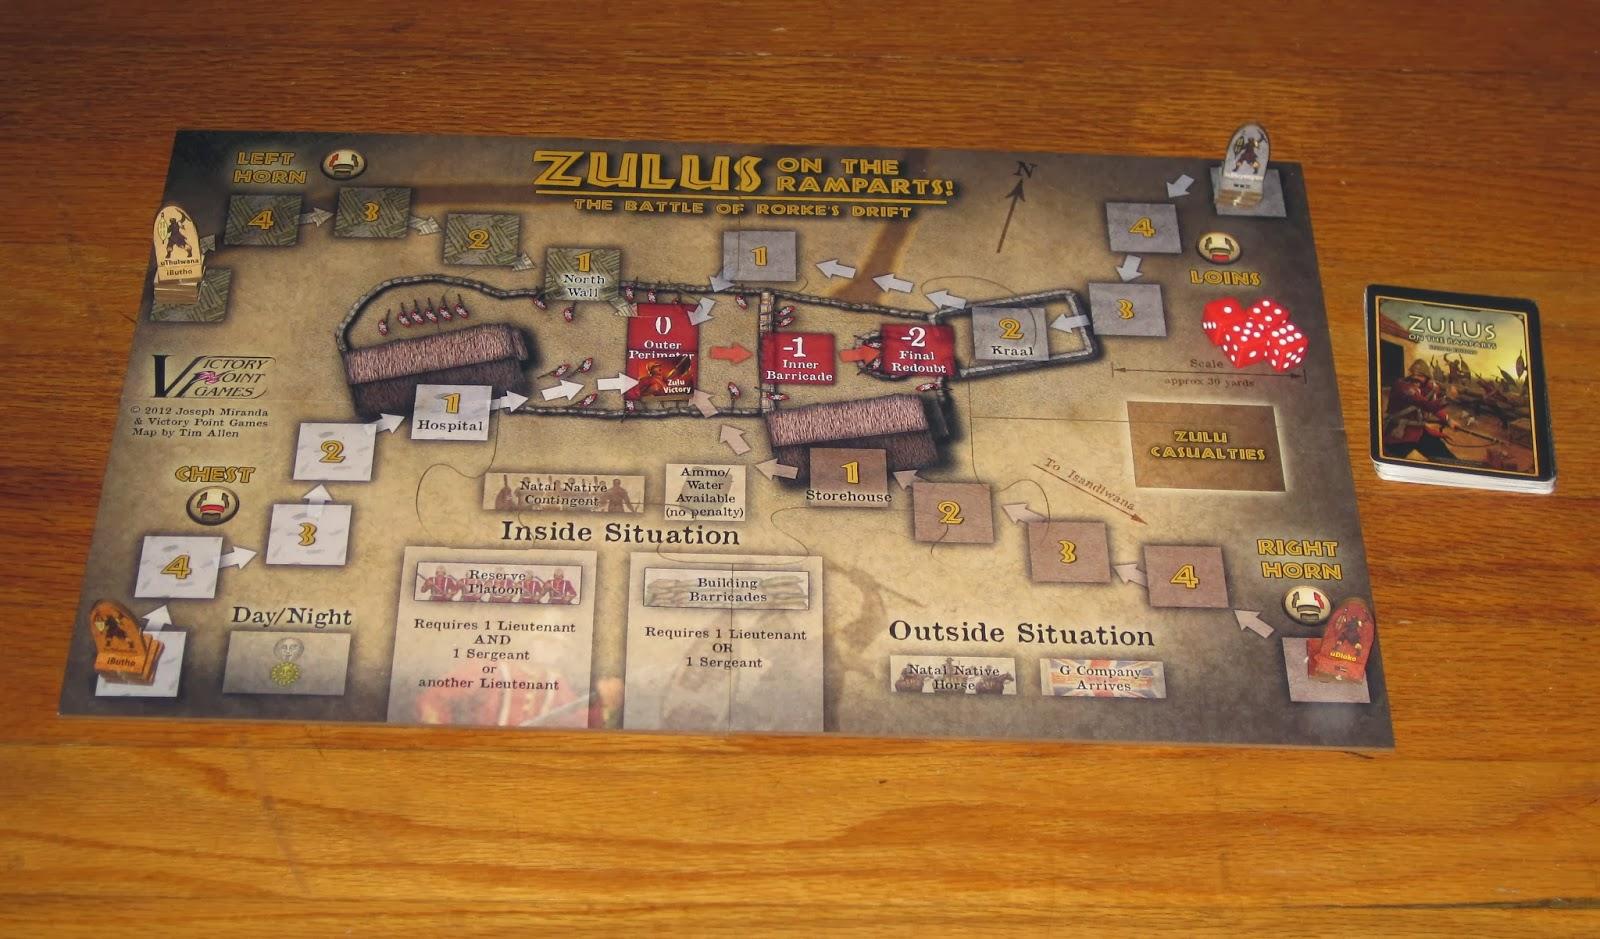 Zulu S Board Game Cafe Street  Main St